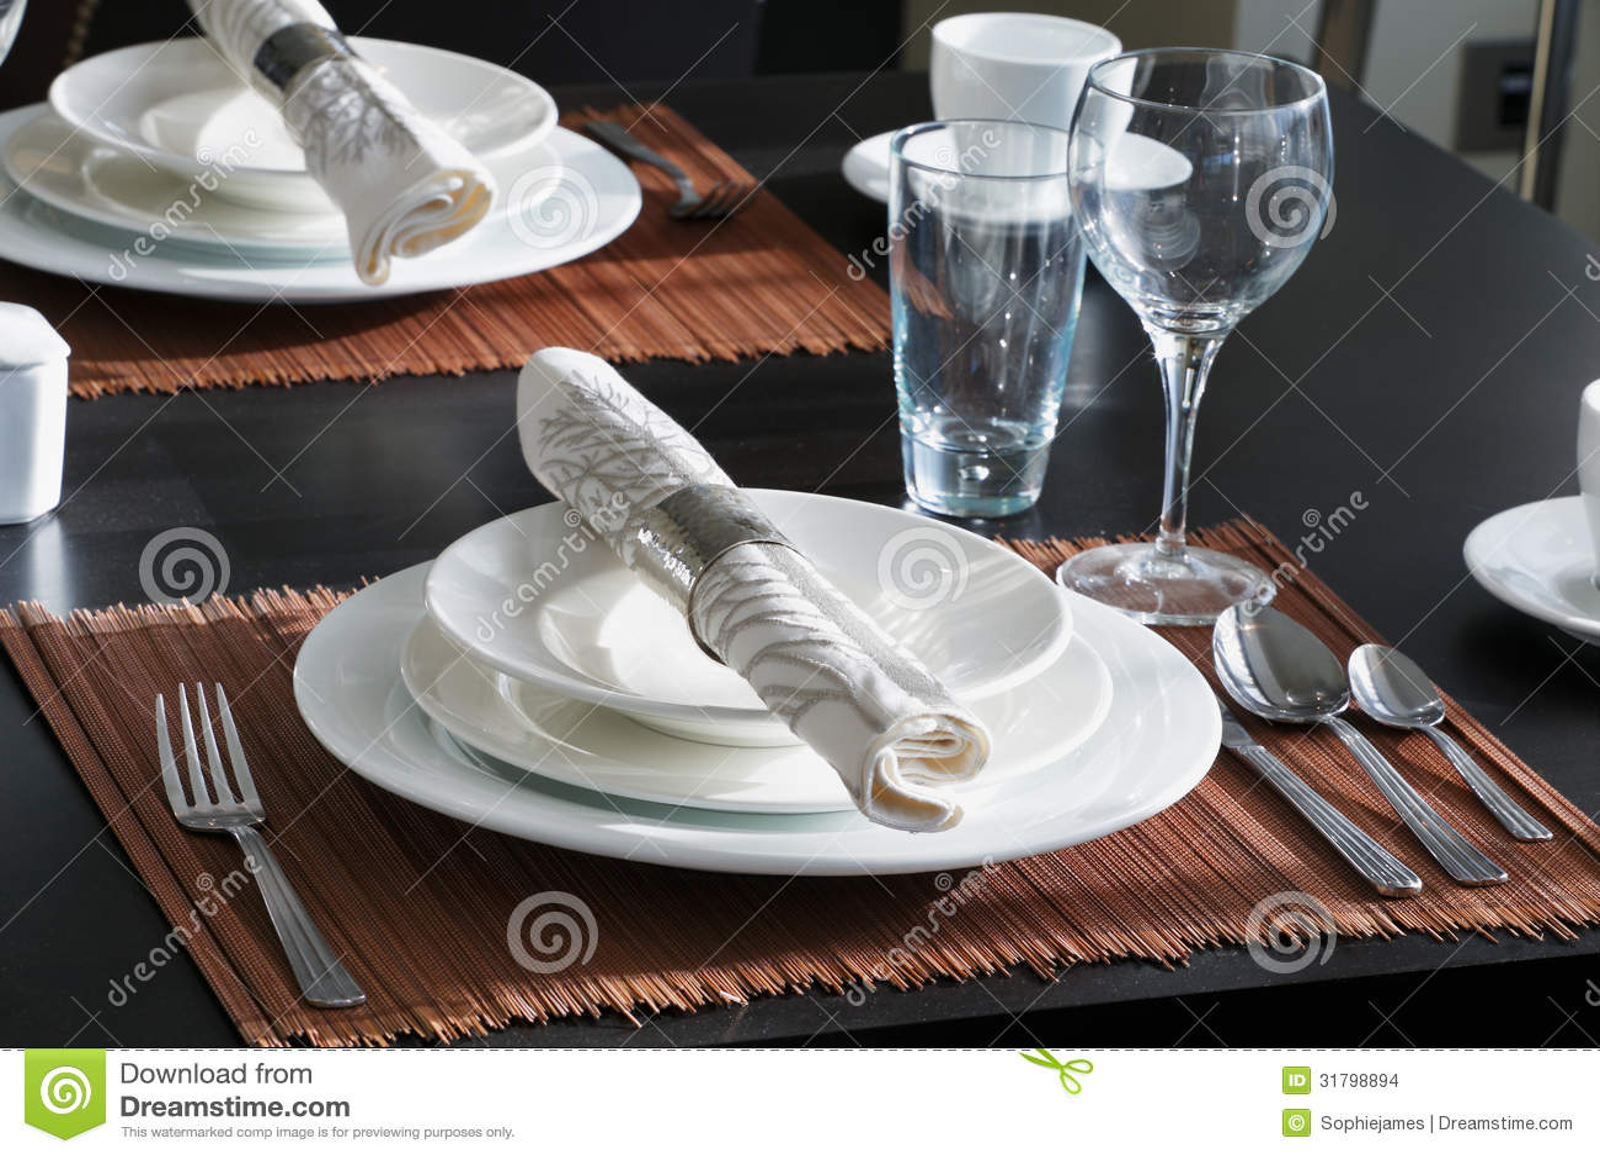 Western Table Setting wwwimgkidcom The Image Kid Has It : table set western style dinner white crockery contrasts wonderfully against dark wooden 31798894 from imgkid.com size 1300 x 956 jpeg 169kB